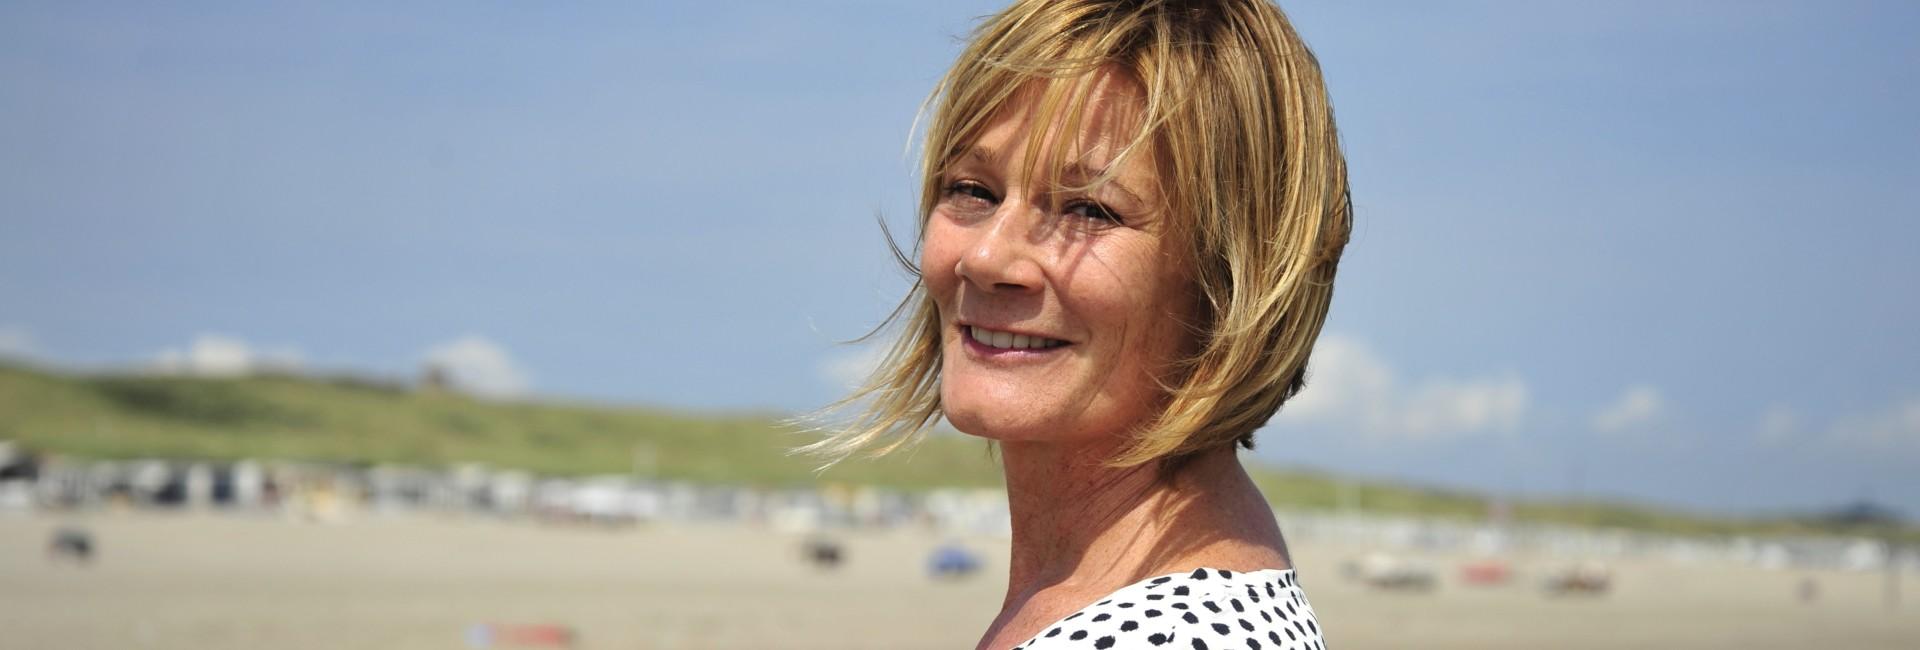 Karin van Kooten | Heemstede Haarlem